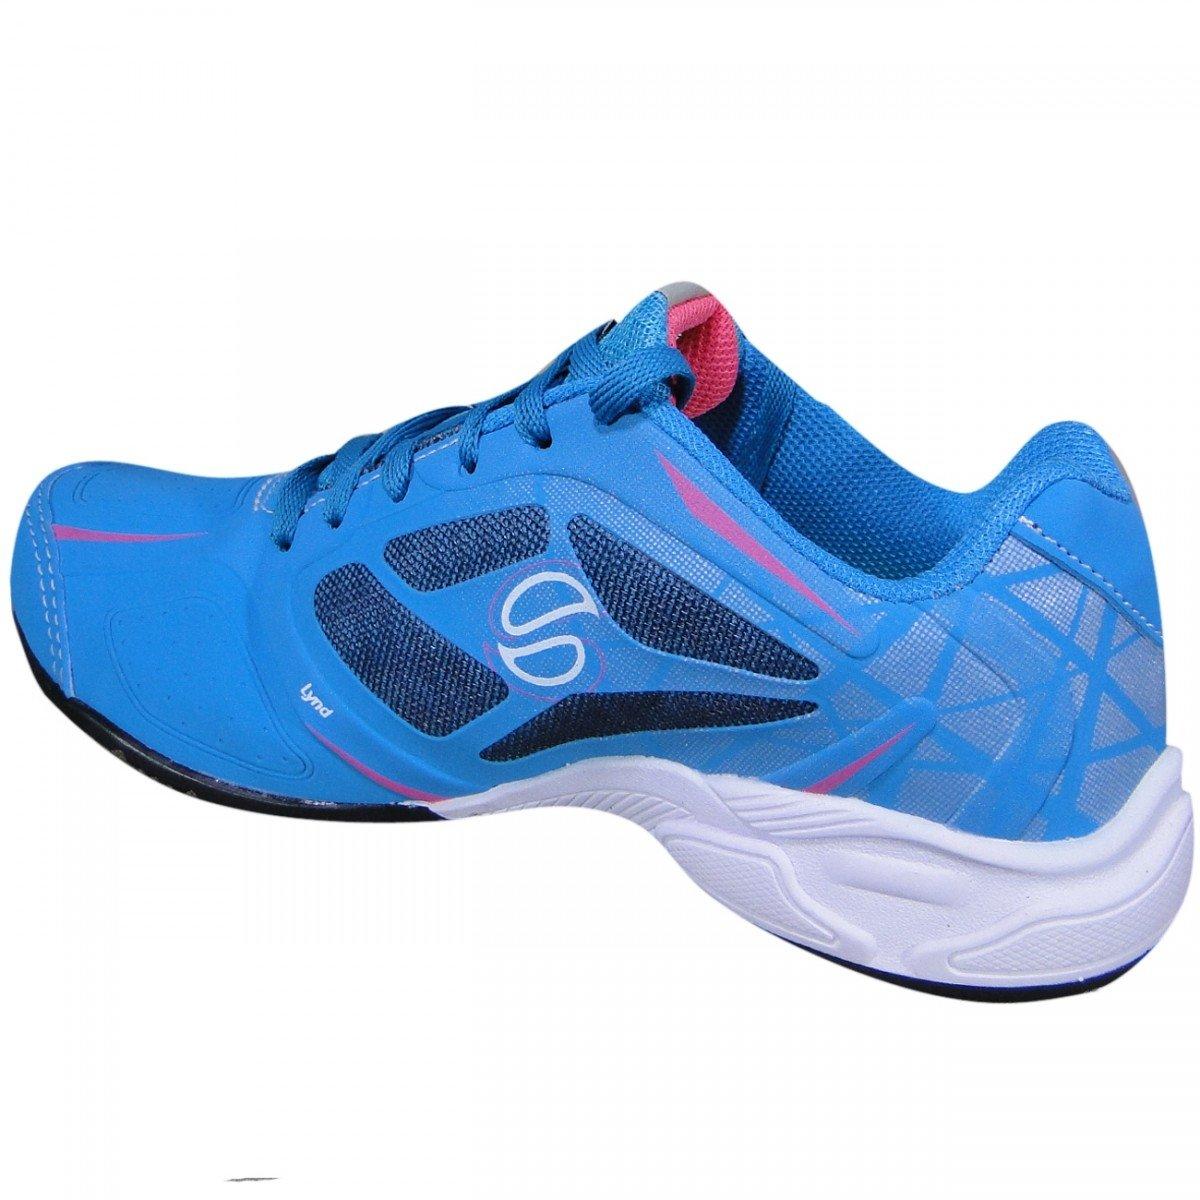 342 2 Claro Azul Lynd Tenis Lynd Tenis Slice 0w4XOnqt